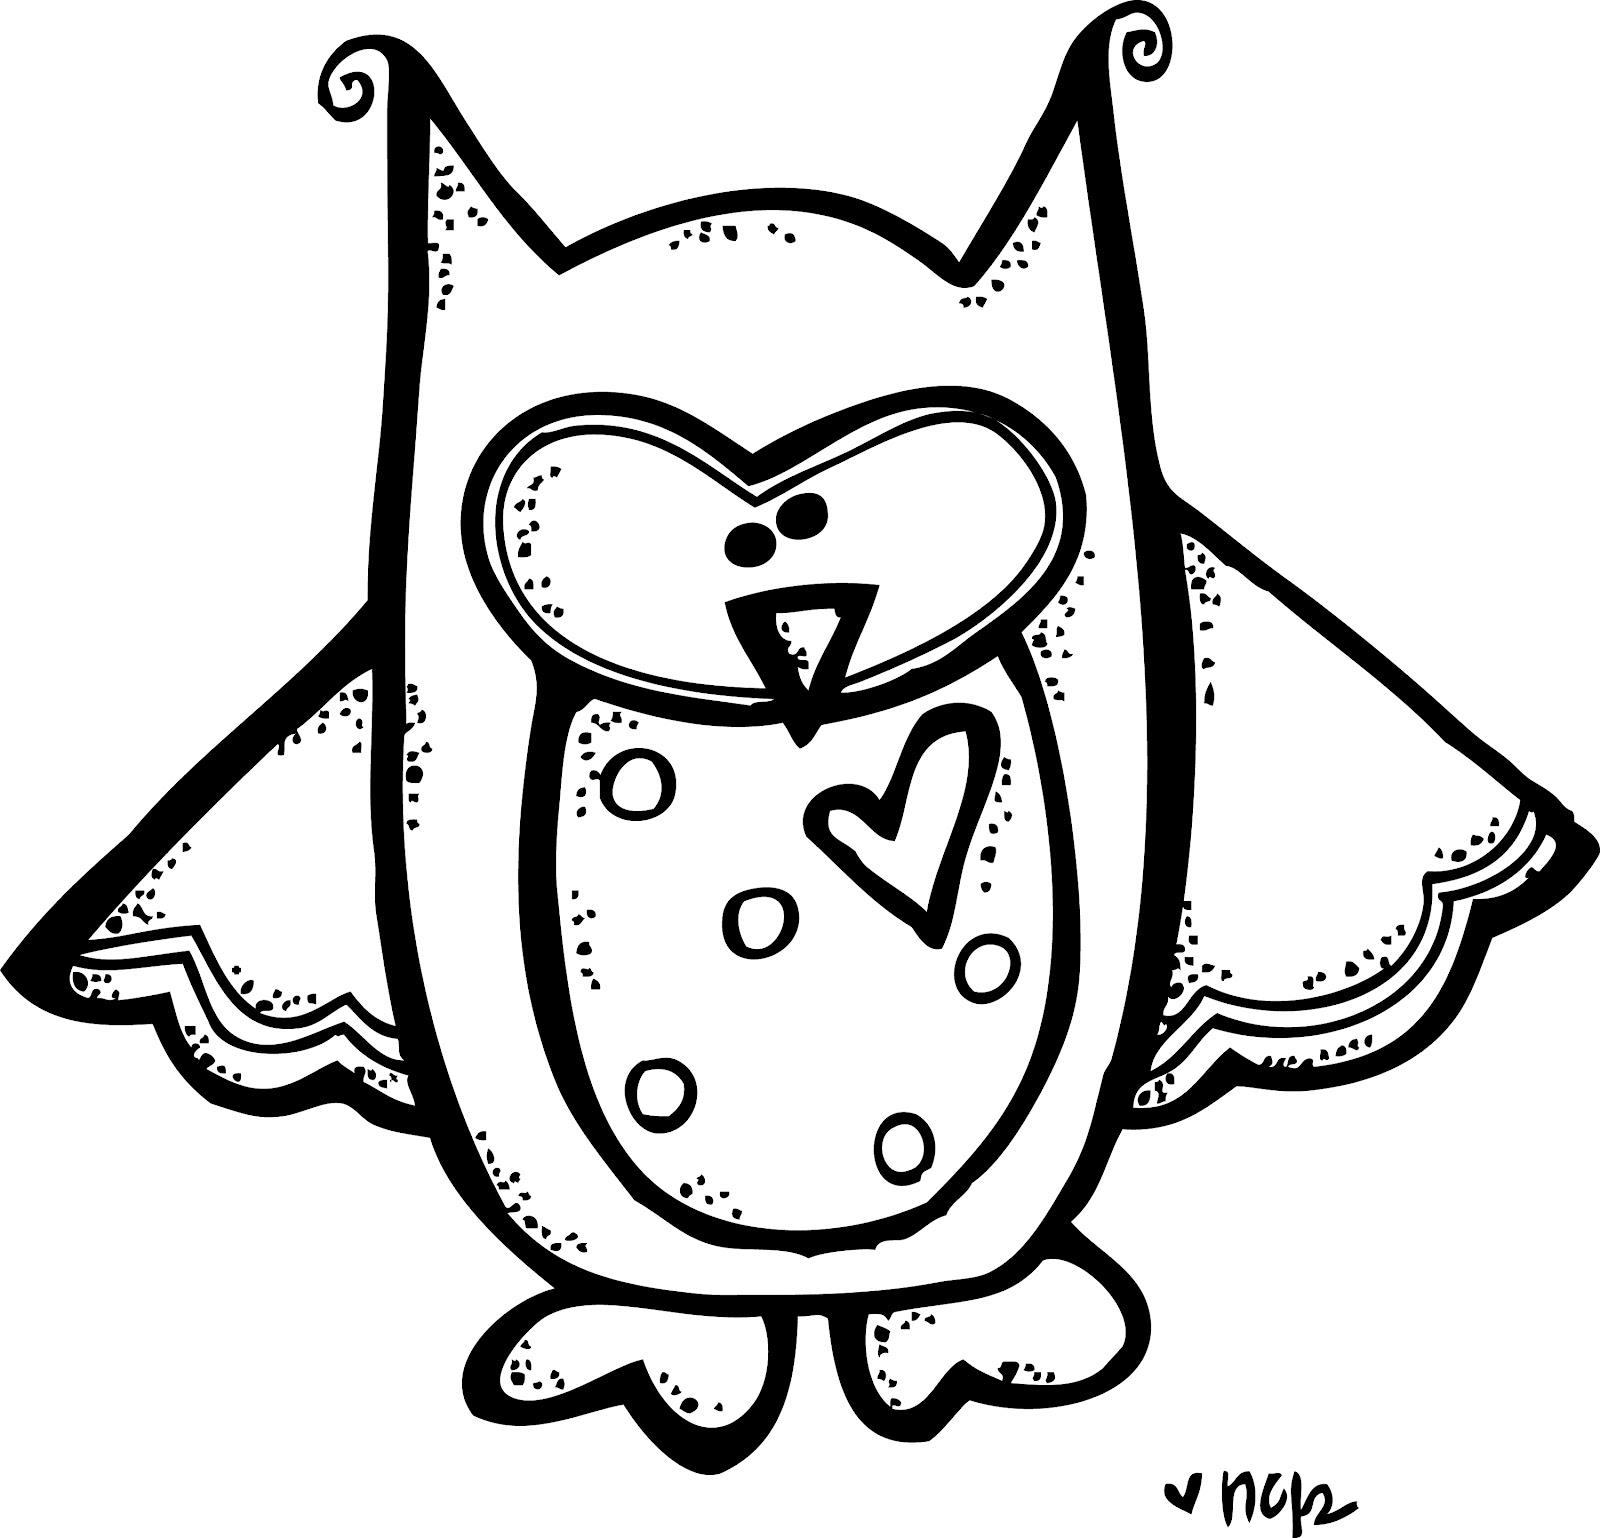 White Owl Clip Art Black And White-White Owl Clip Art Black and White-17